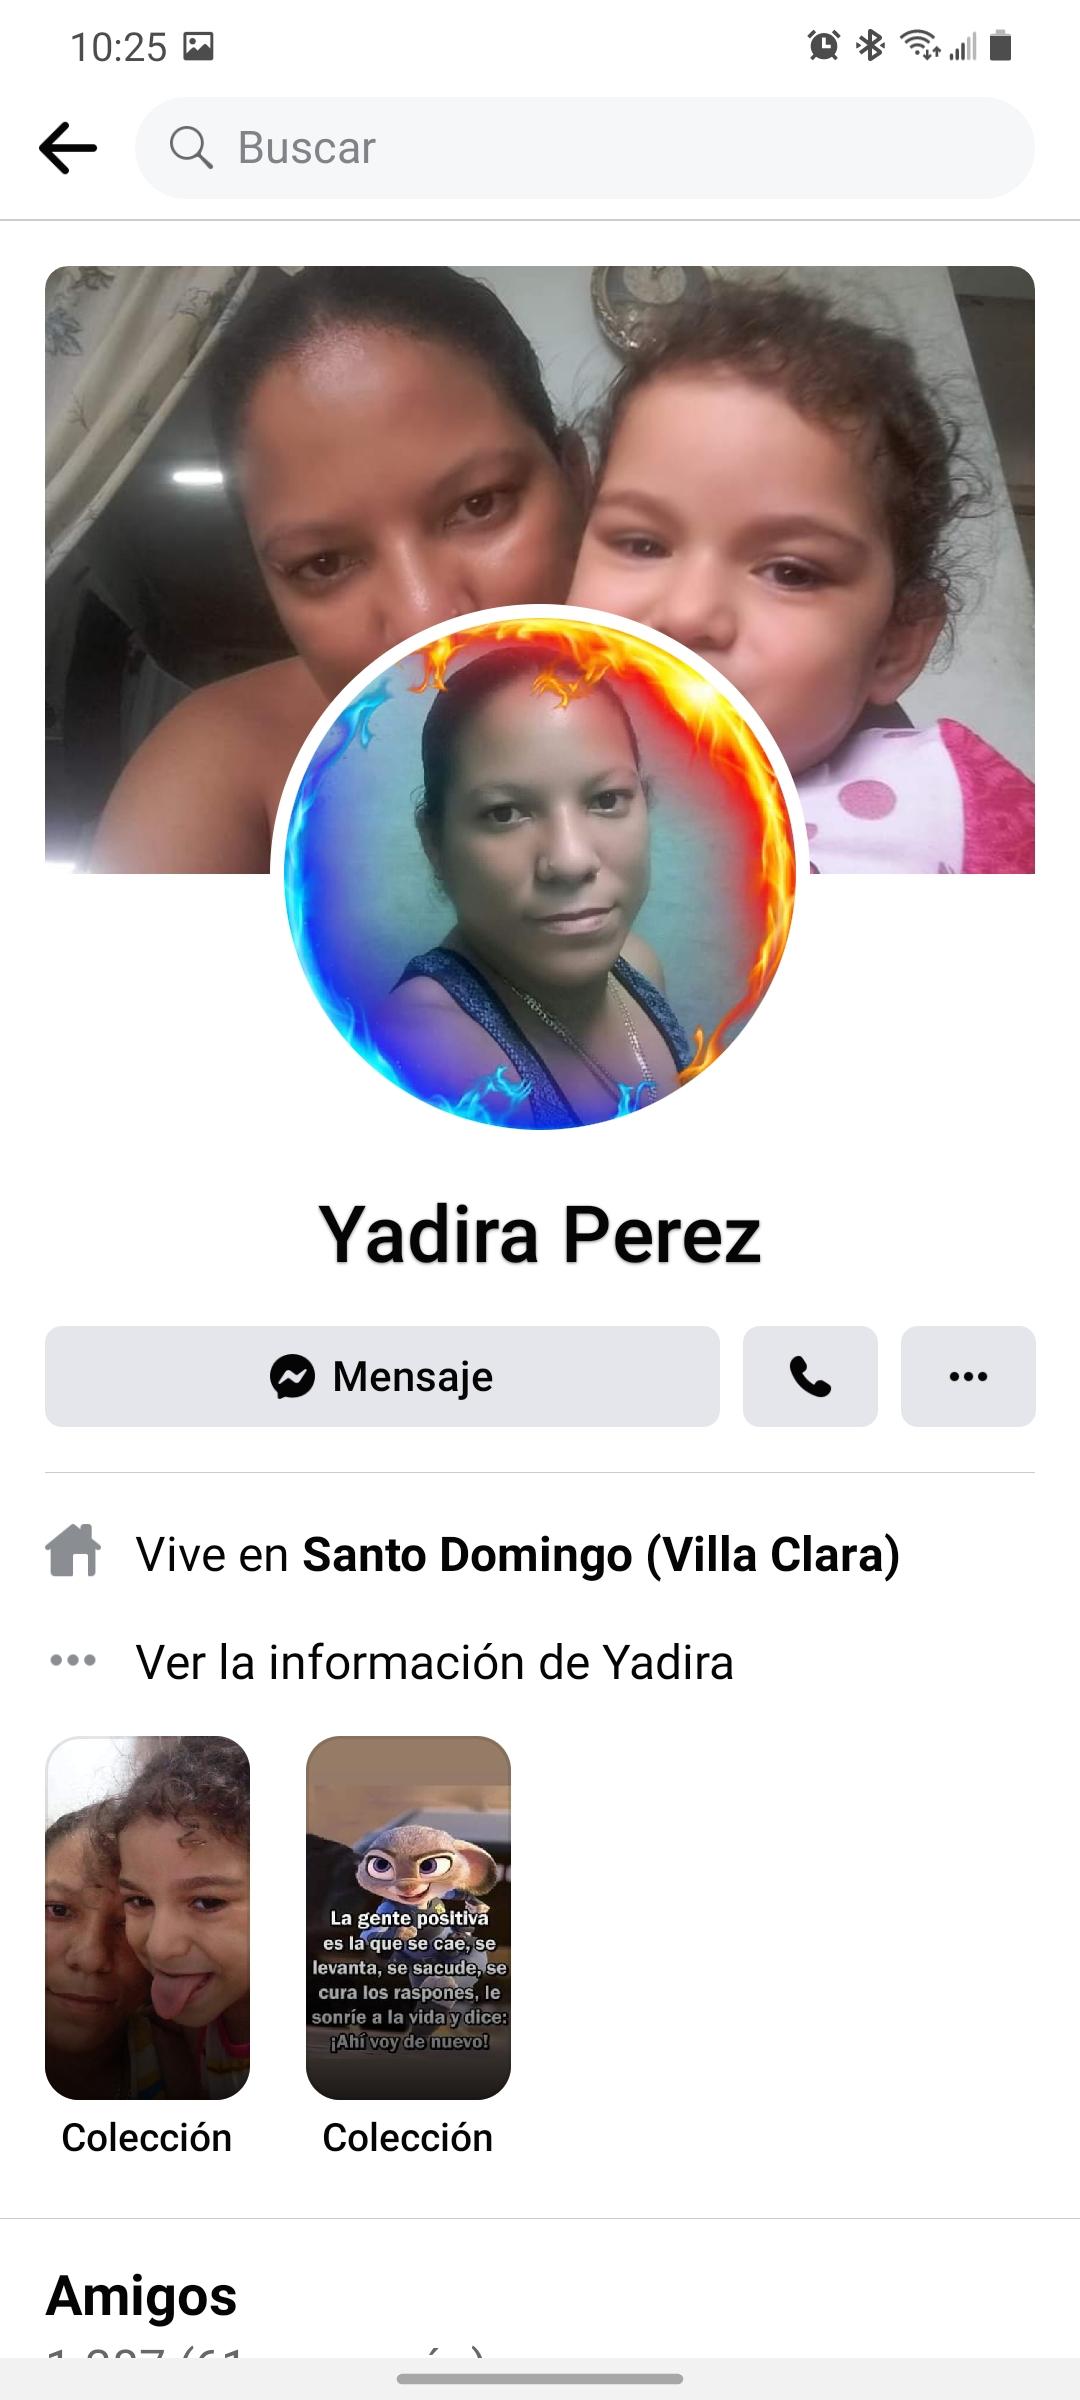 Yadira Perez